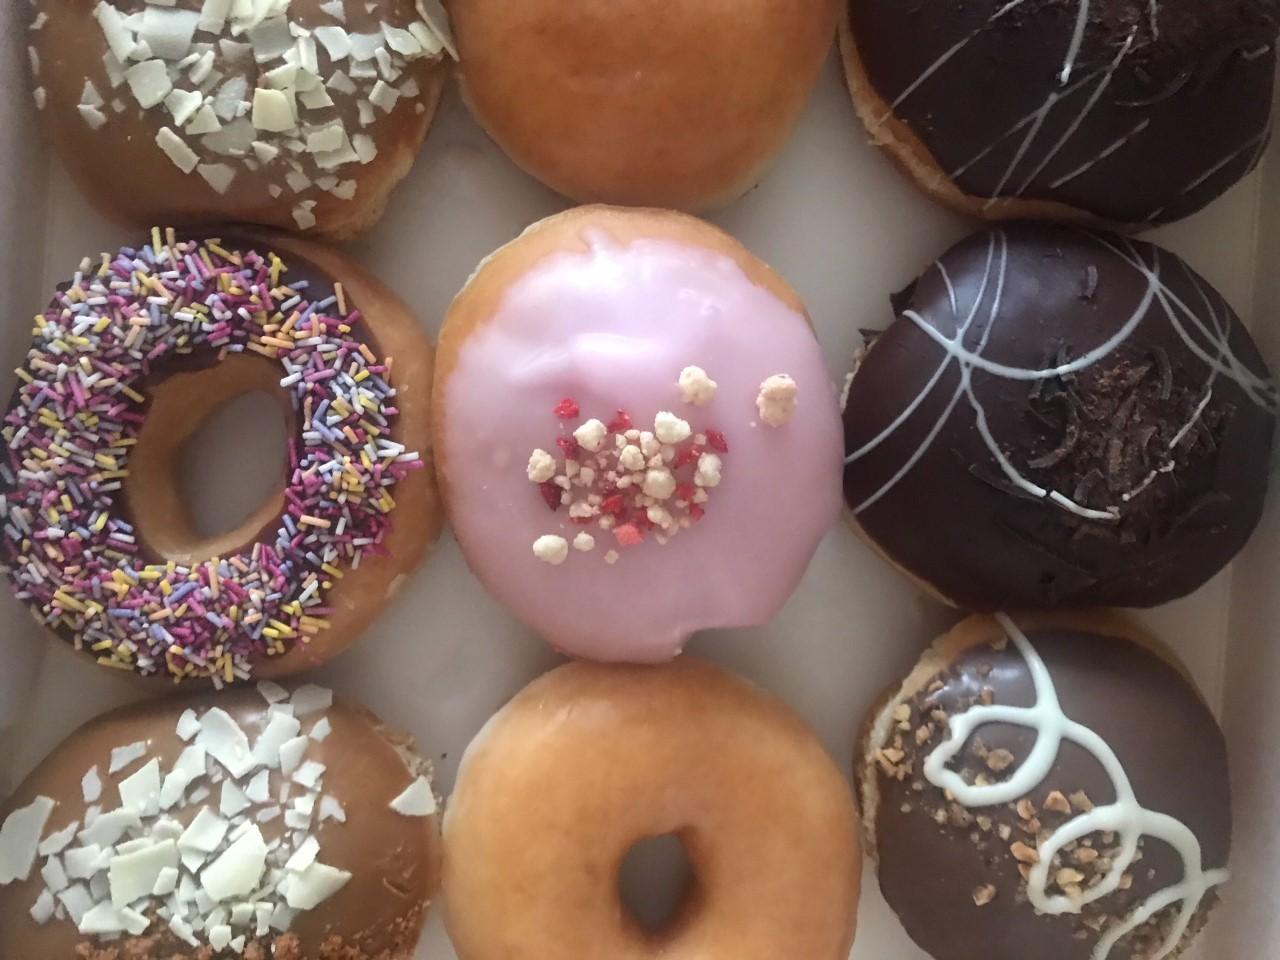 Doughnuts are always a good idea...